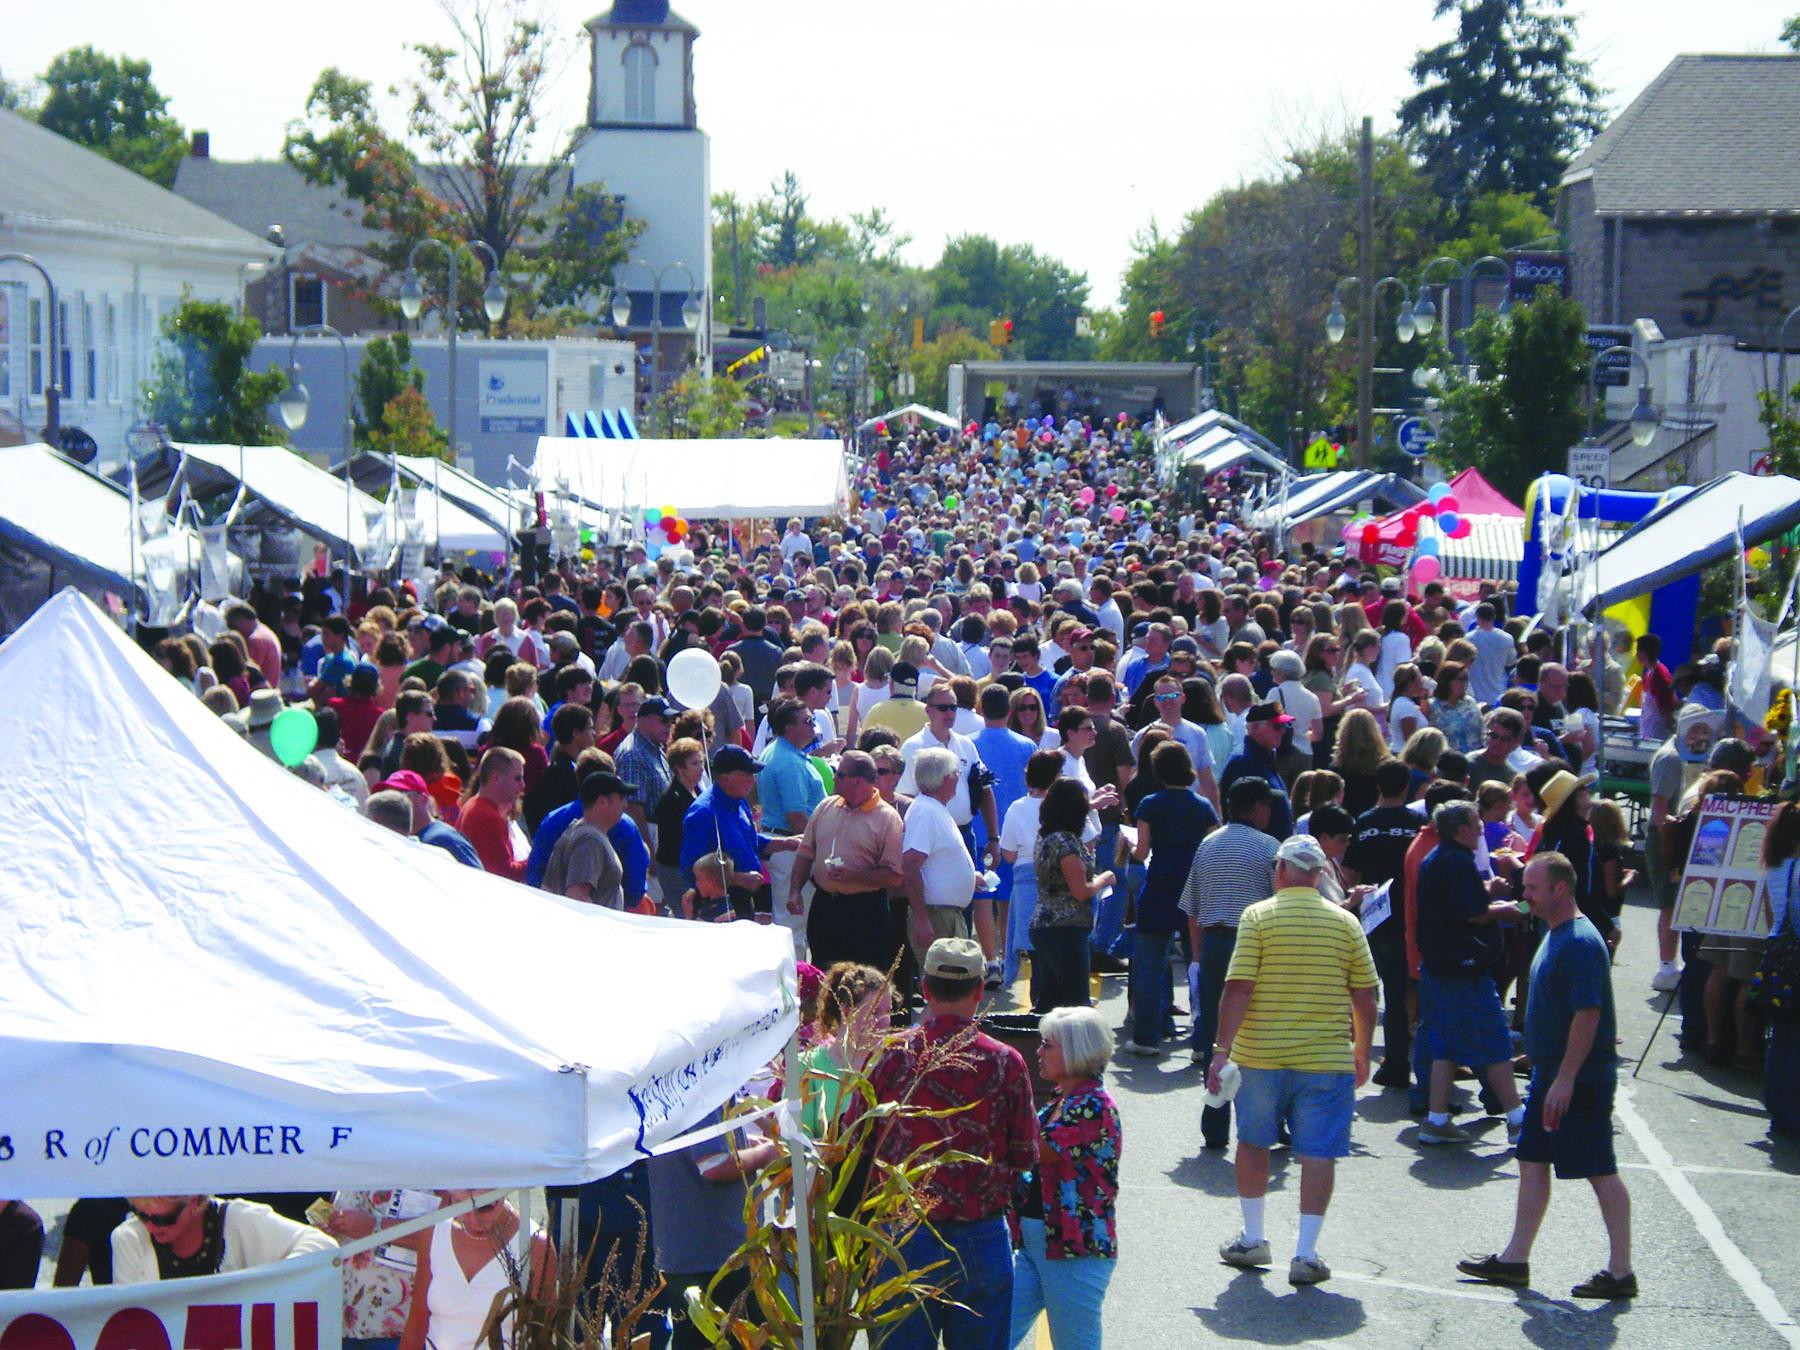 Clarkston_Main Street During Taste